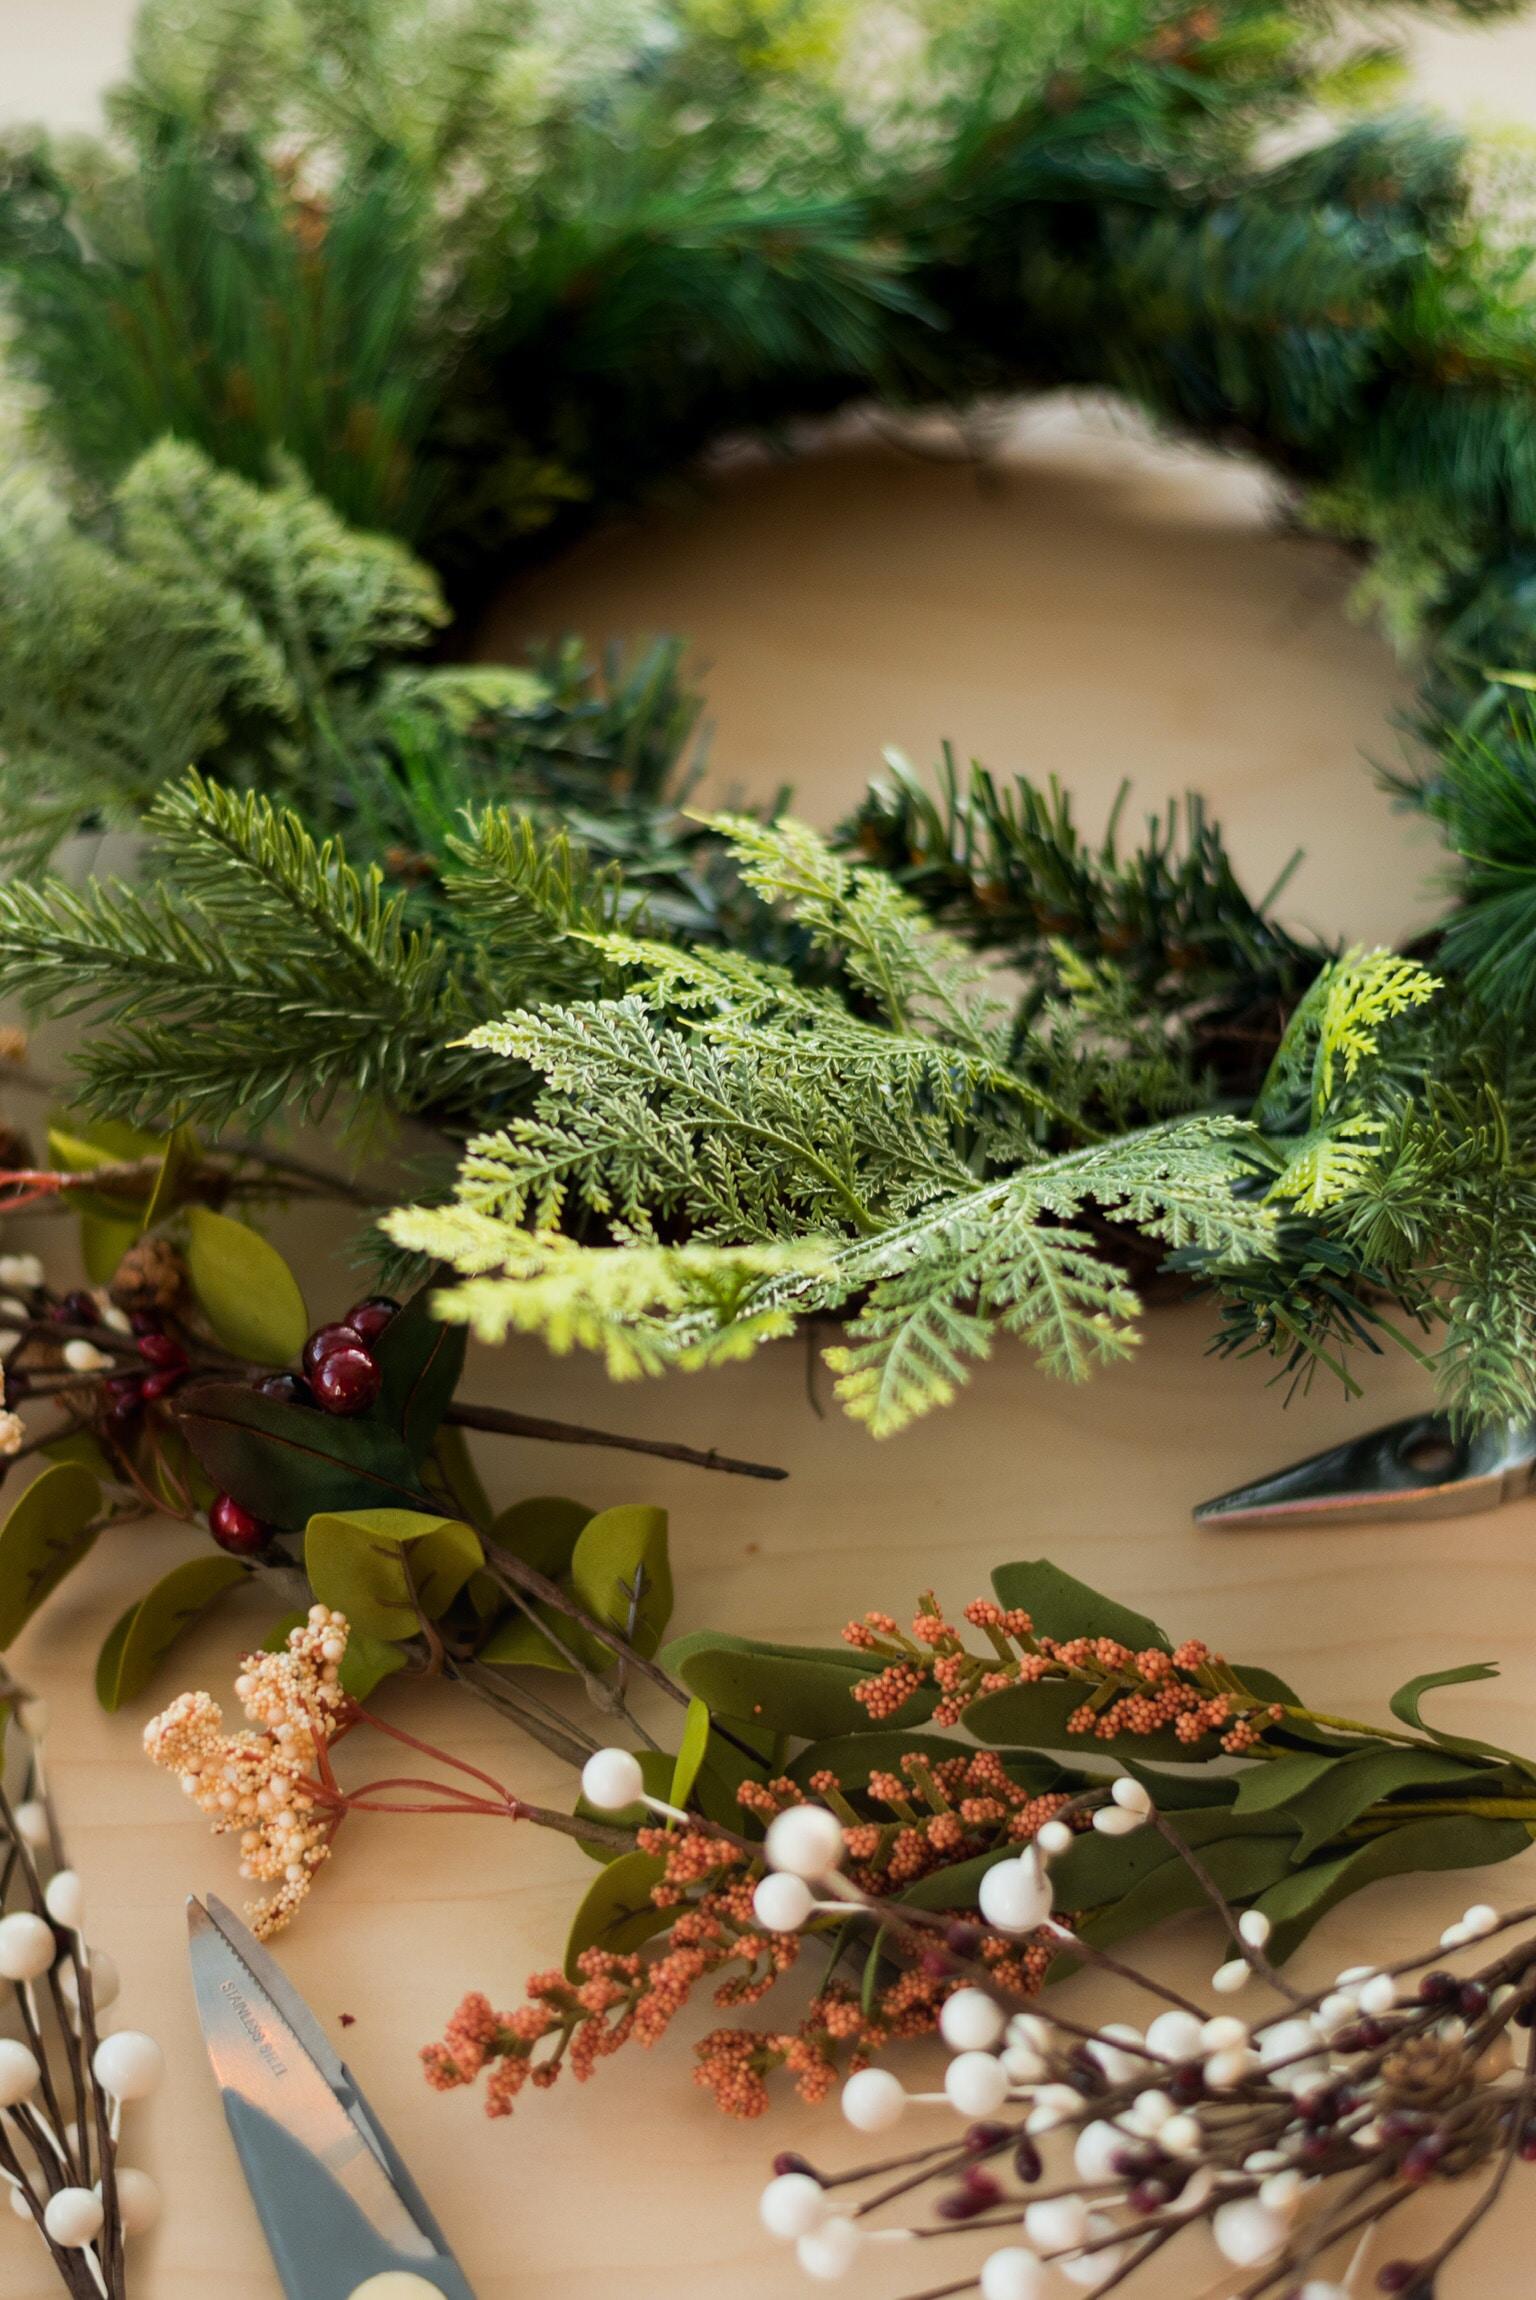 Christmas wreath on brown surface